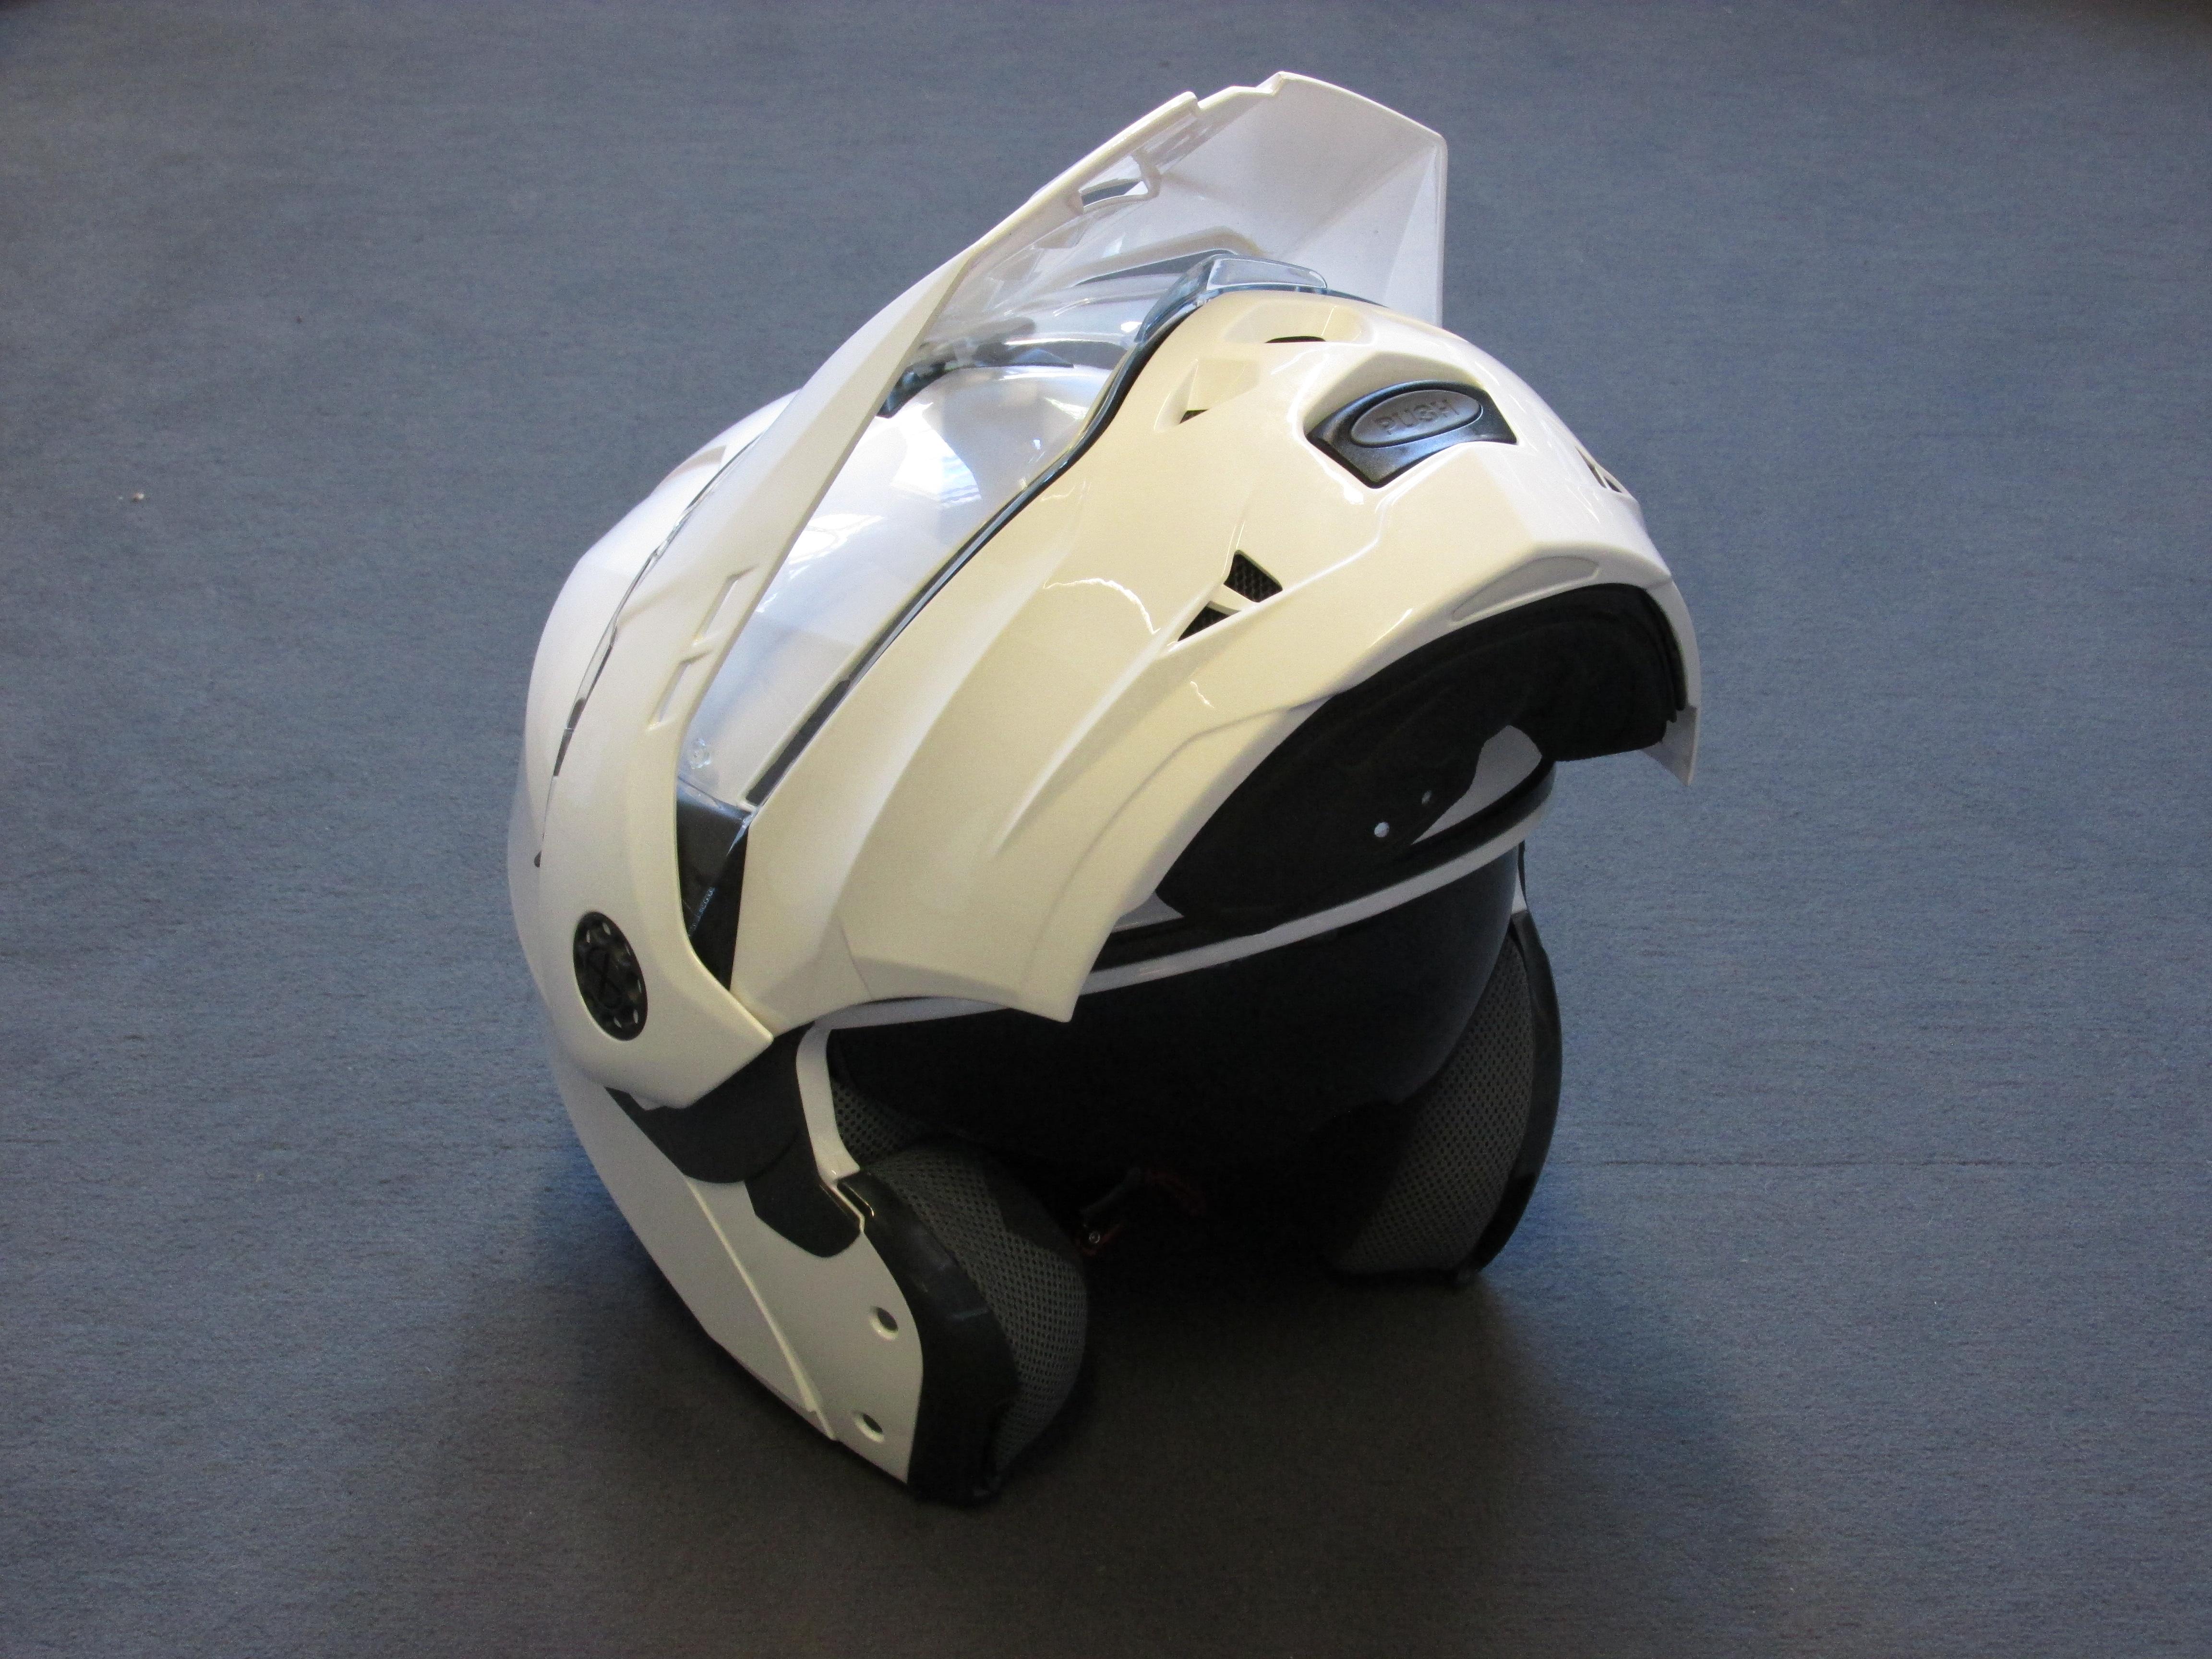 Review: Caberg Tourmax helmet